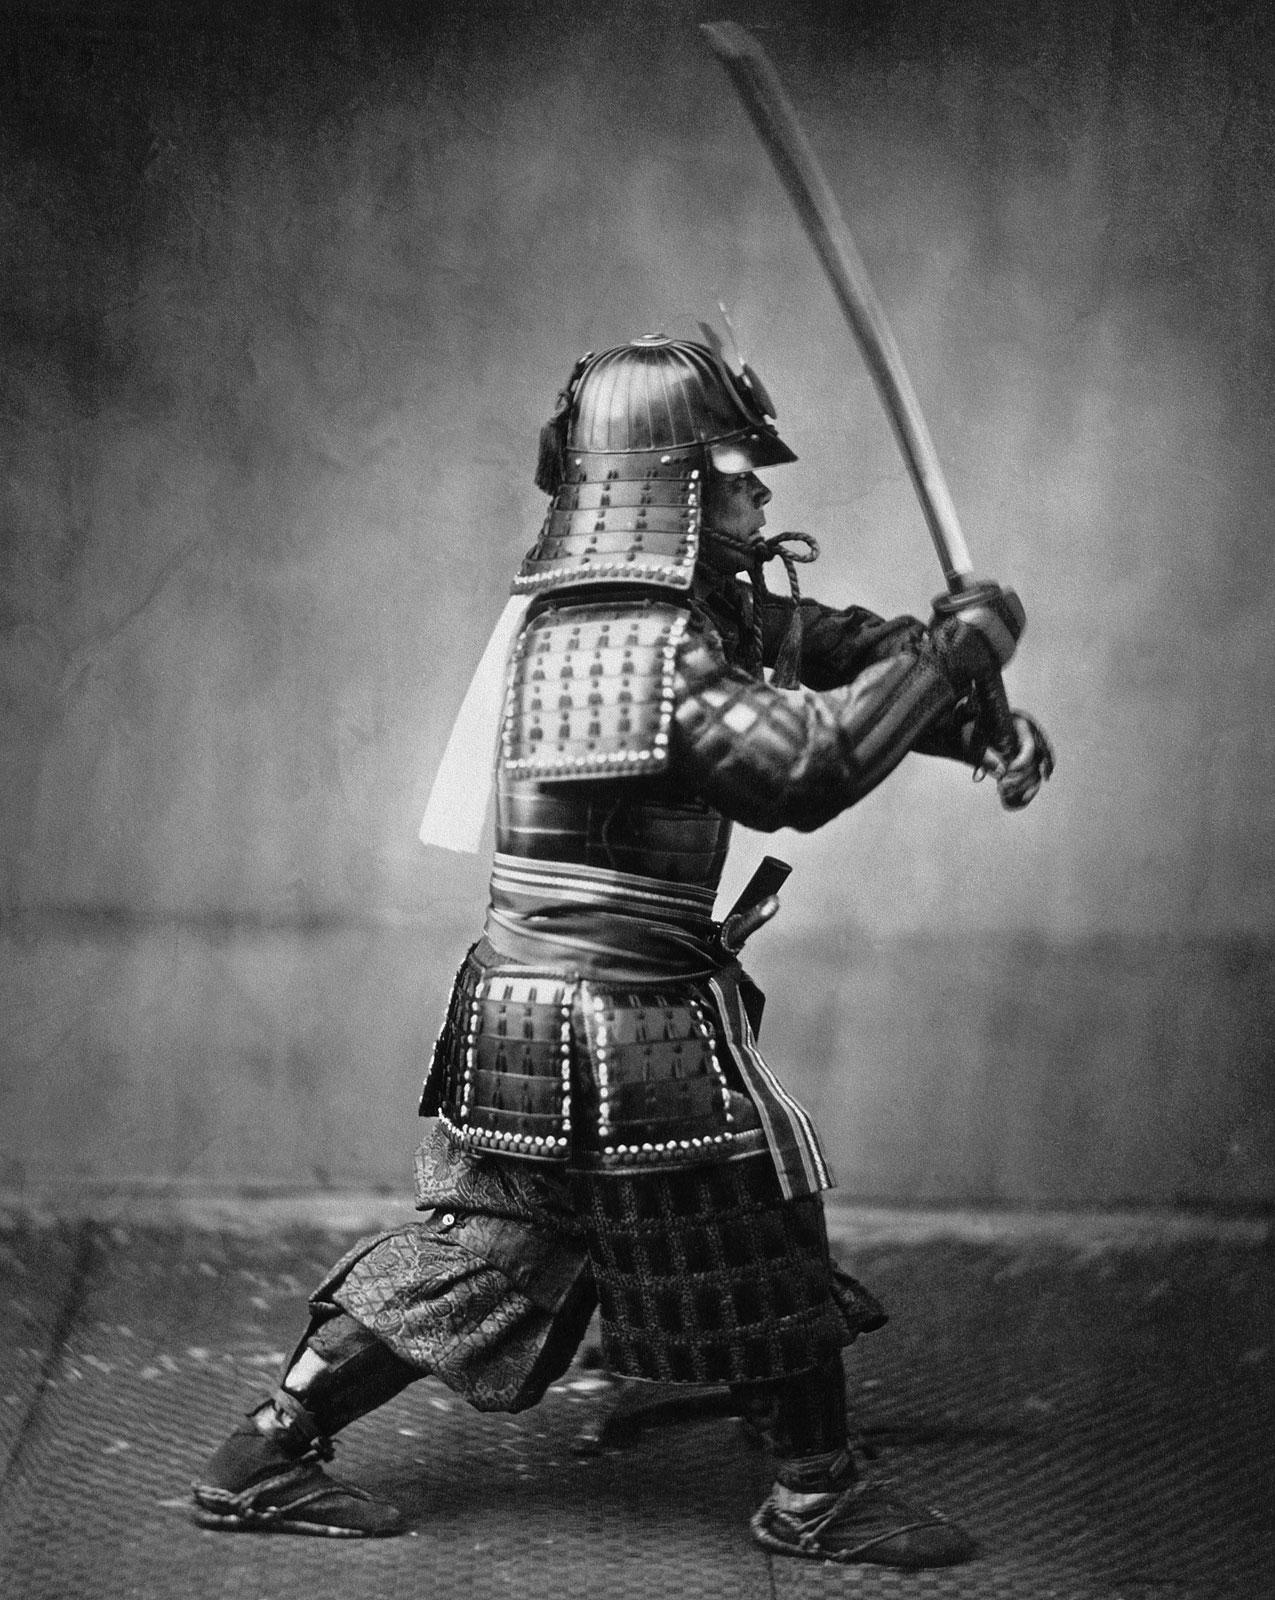 Armoured samurai with sword and dagger,Felice Beato (circa 1860)via Wikimedia Commons